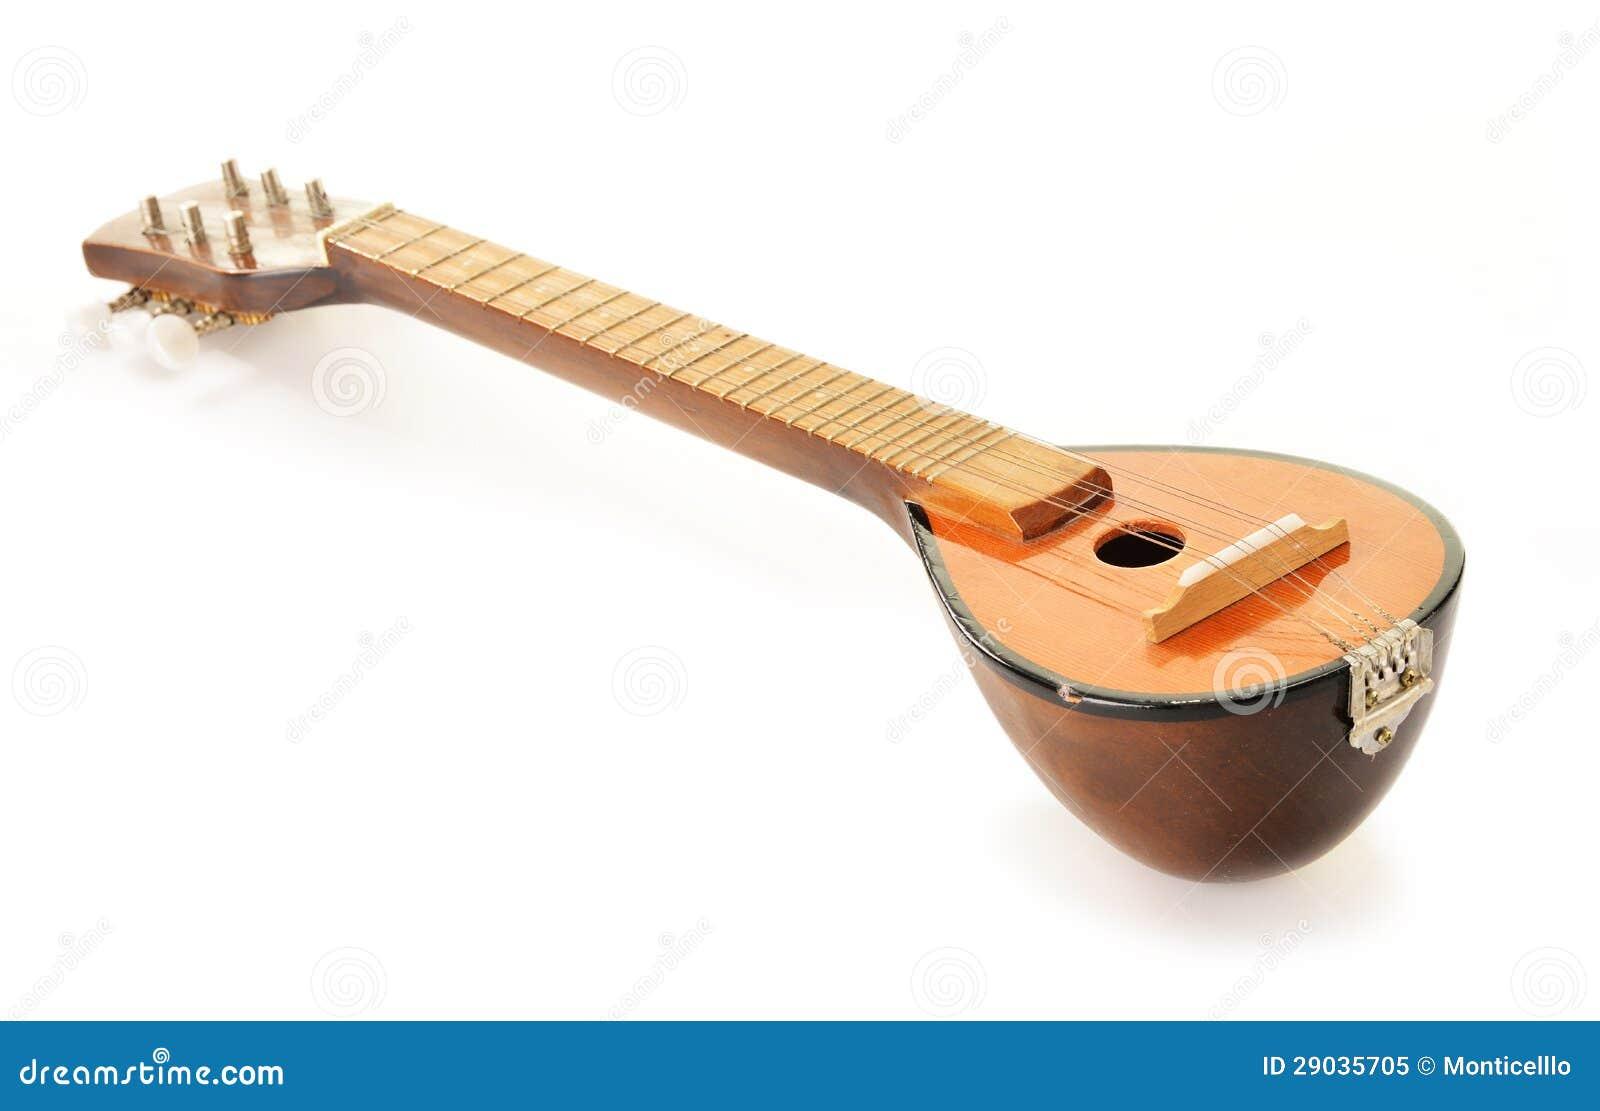 Musical Instruments Clipart | Chadholtz